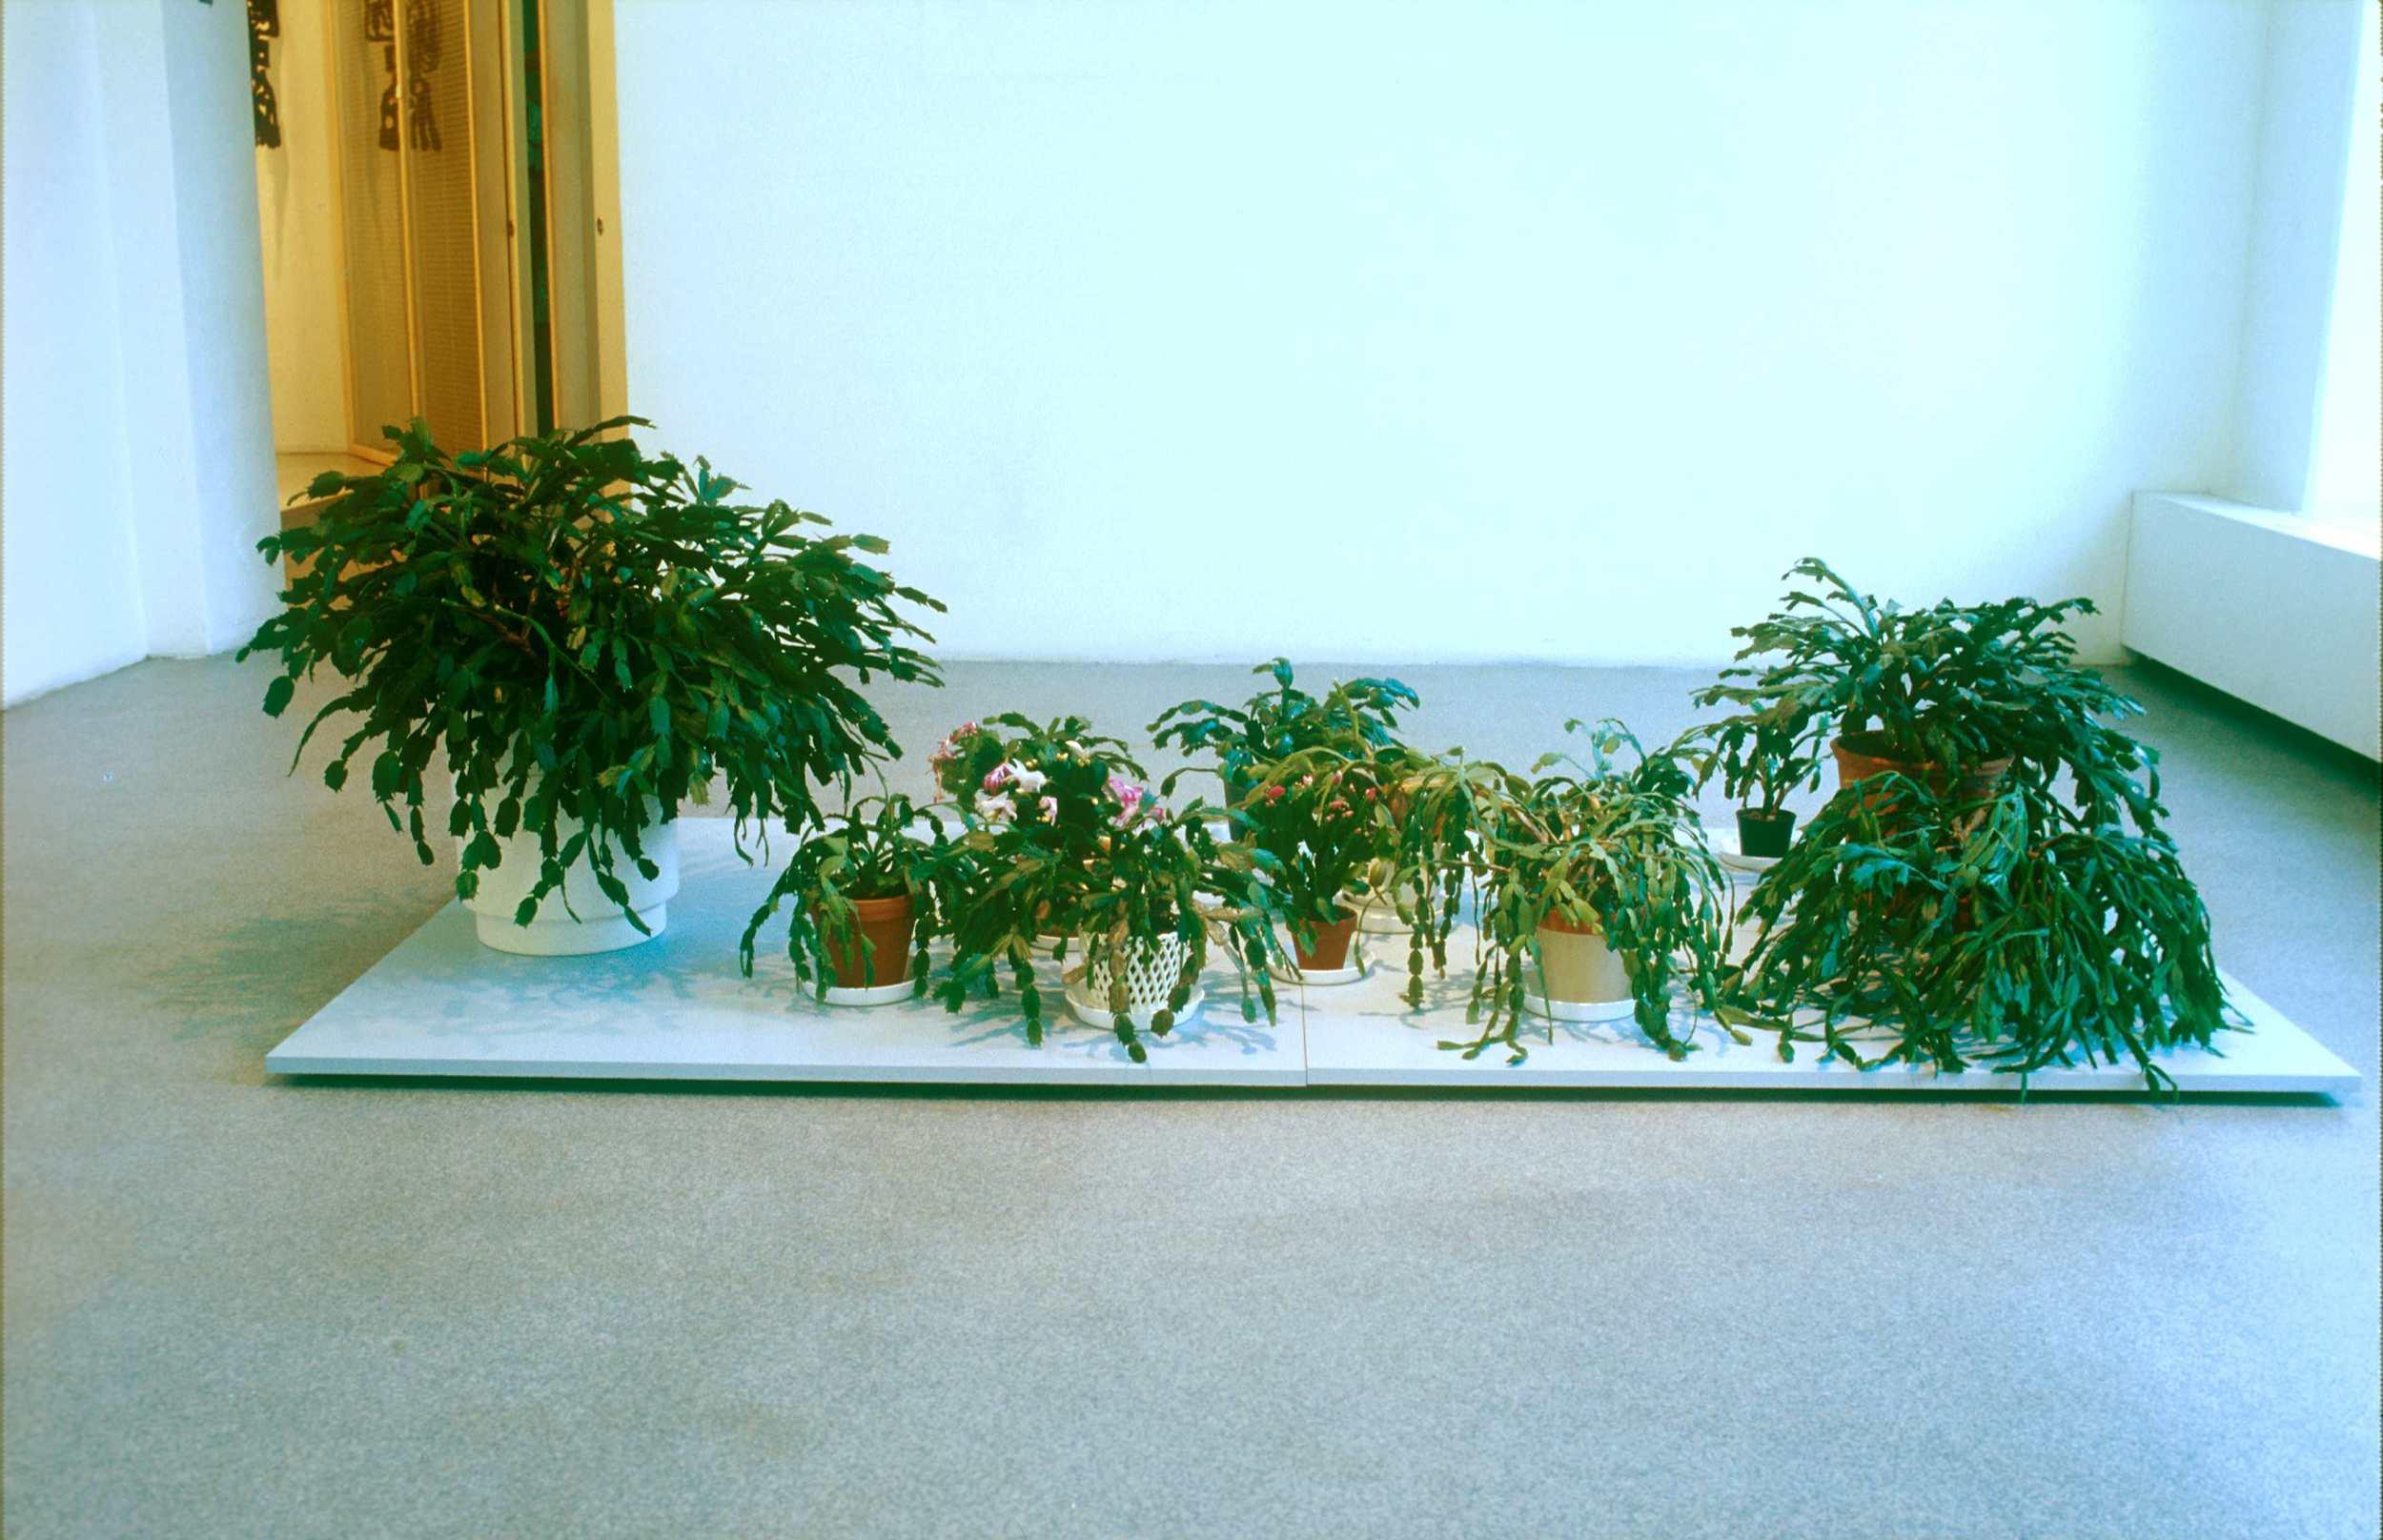 Meeting of Christmas Cactus, 2002